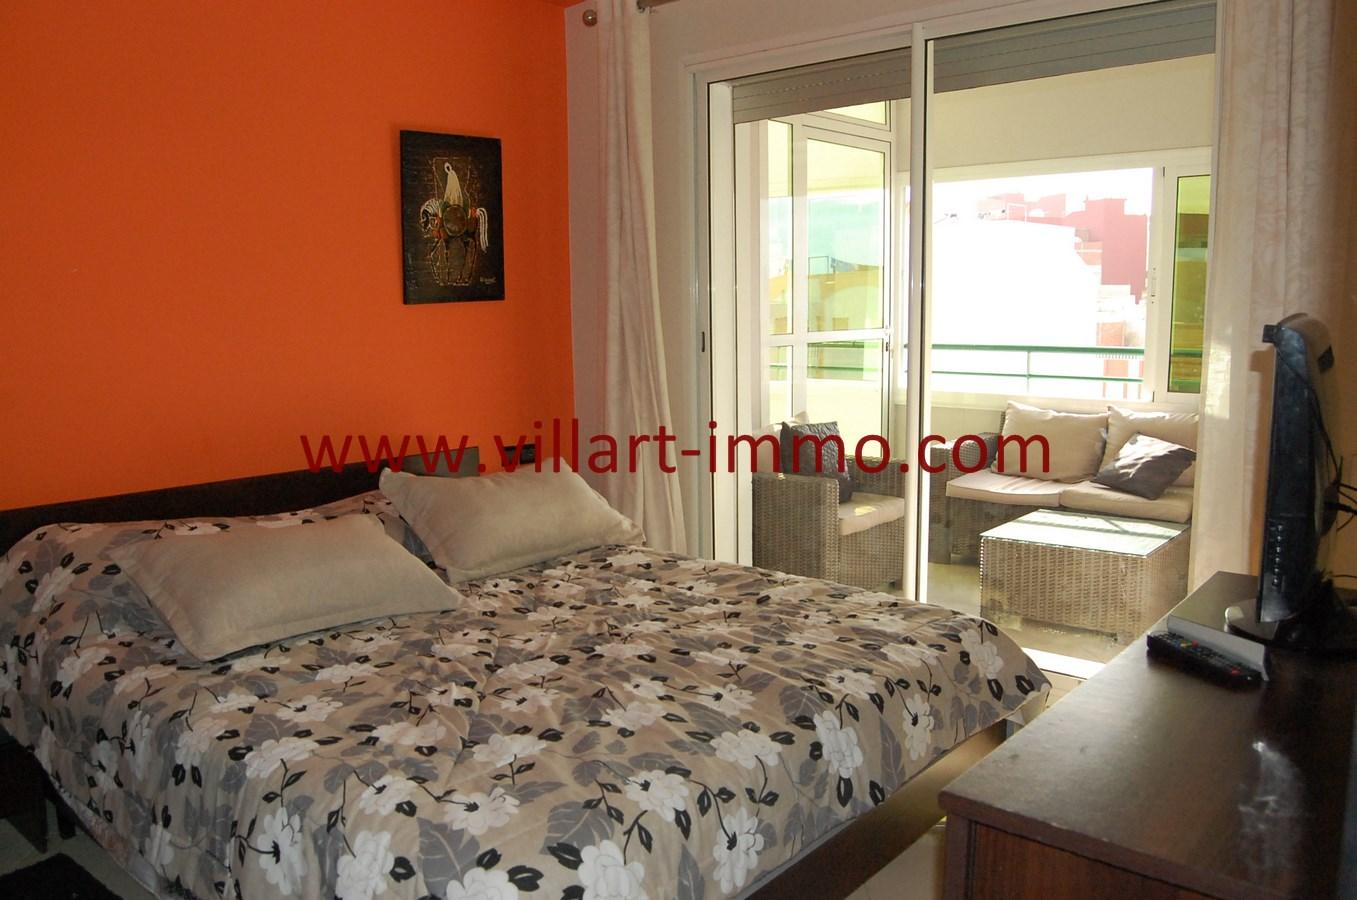 4-Vente-Appartement-Tanger-Chambre 1-VA480-Villart Immo